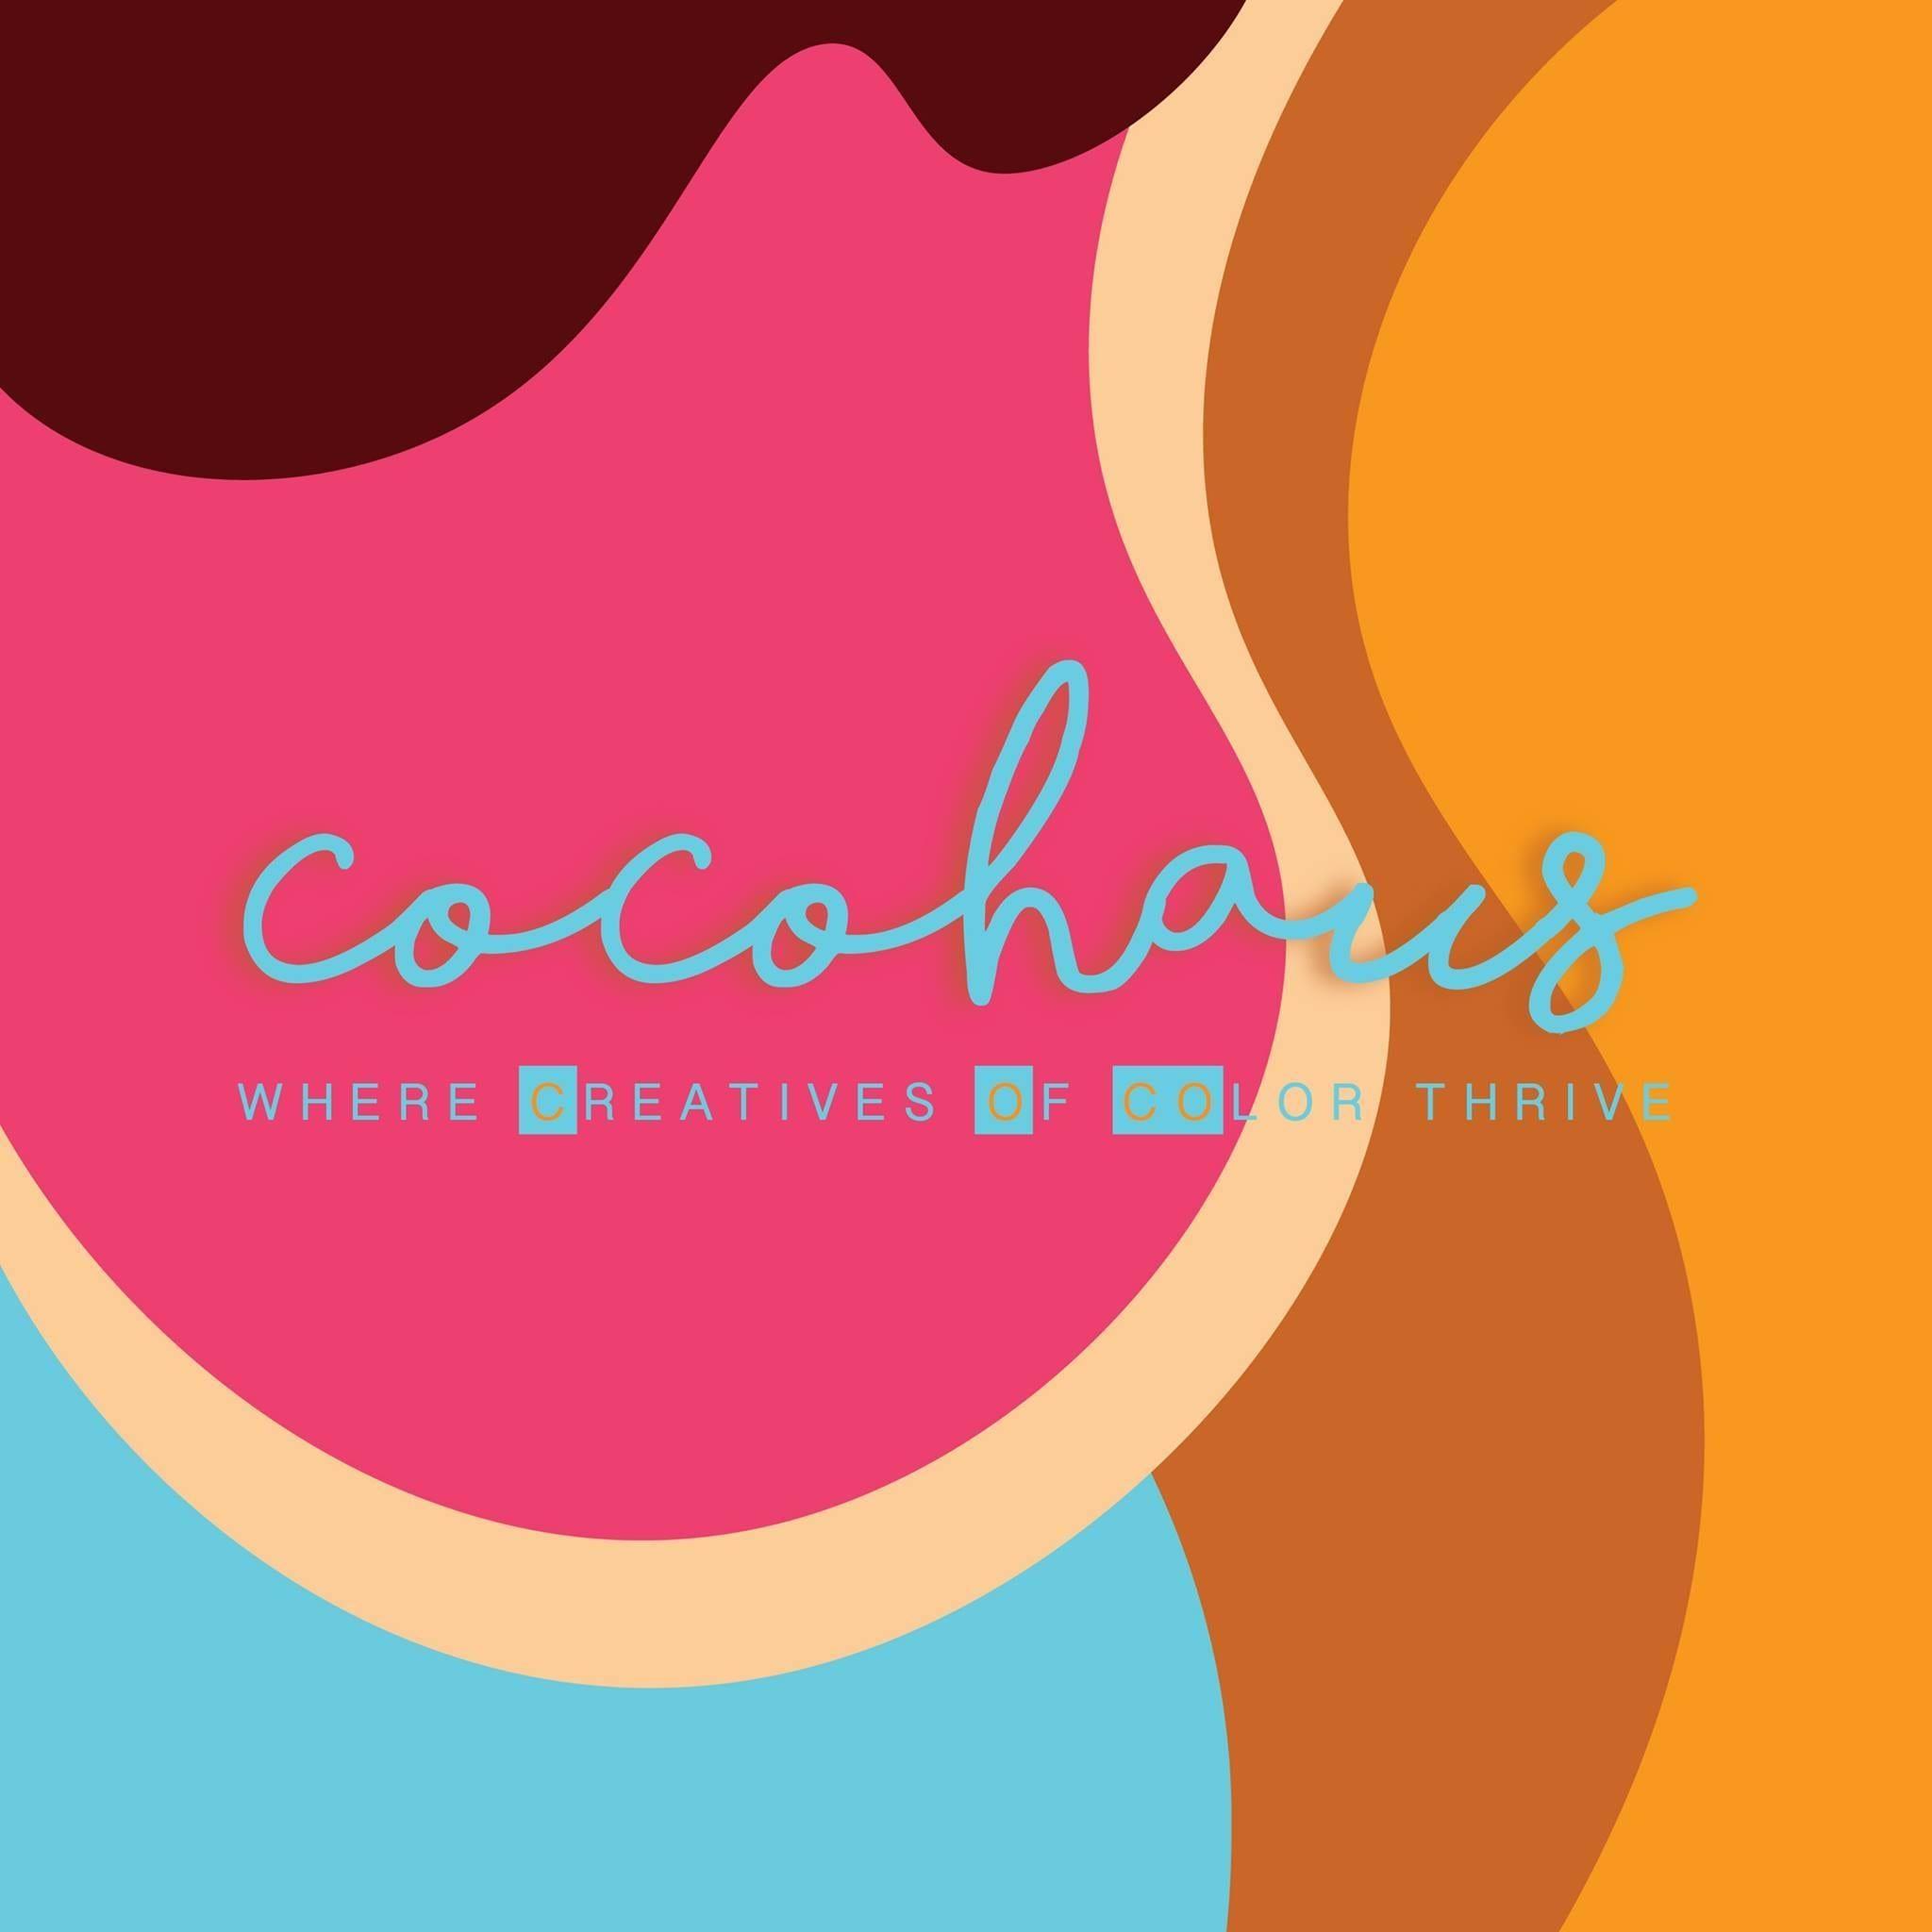 CoCoHaus